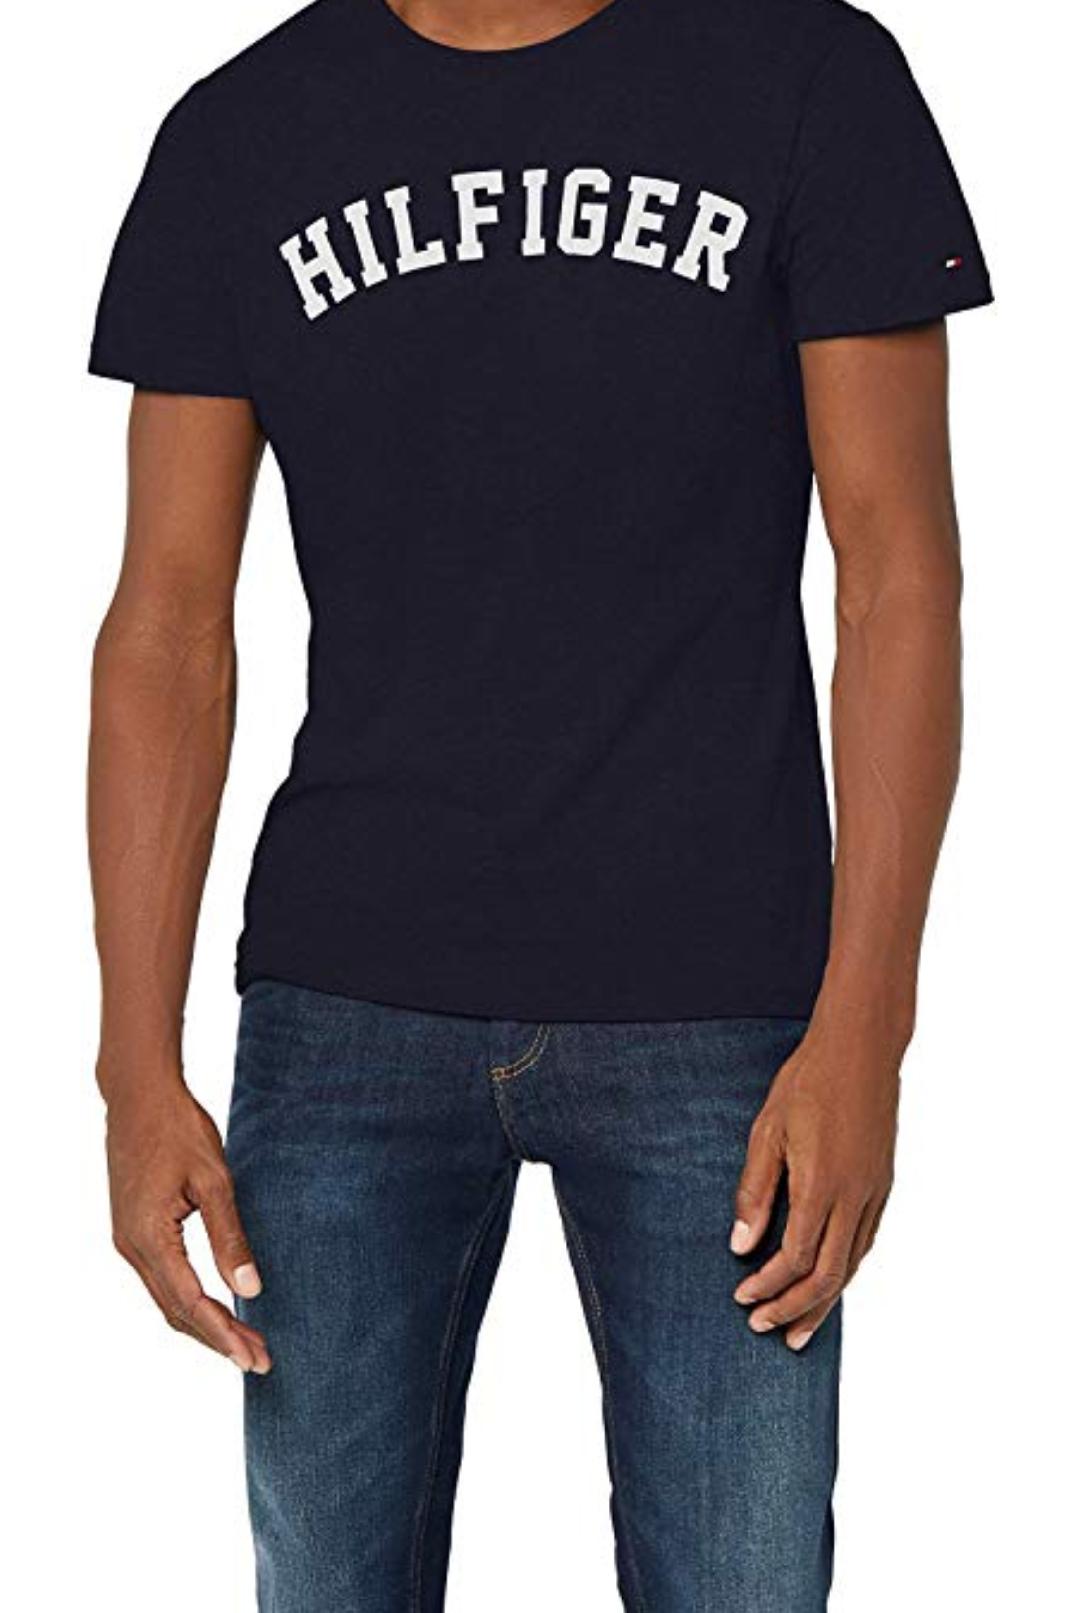 [Prime] Tommy Hilfiger Herren T-Shirt blau / grau (S-XXL)